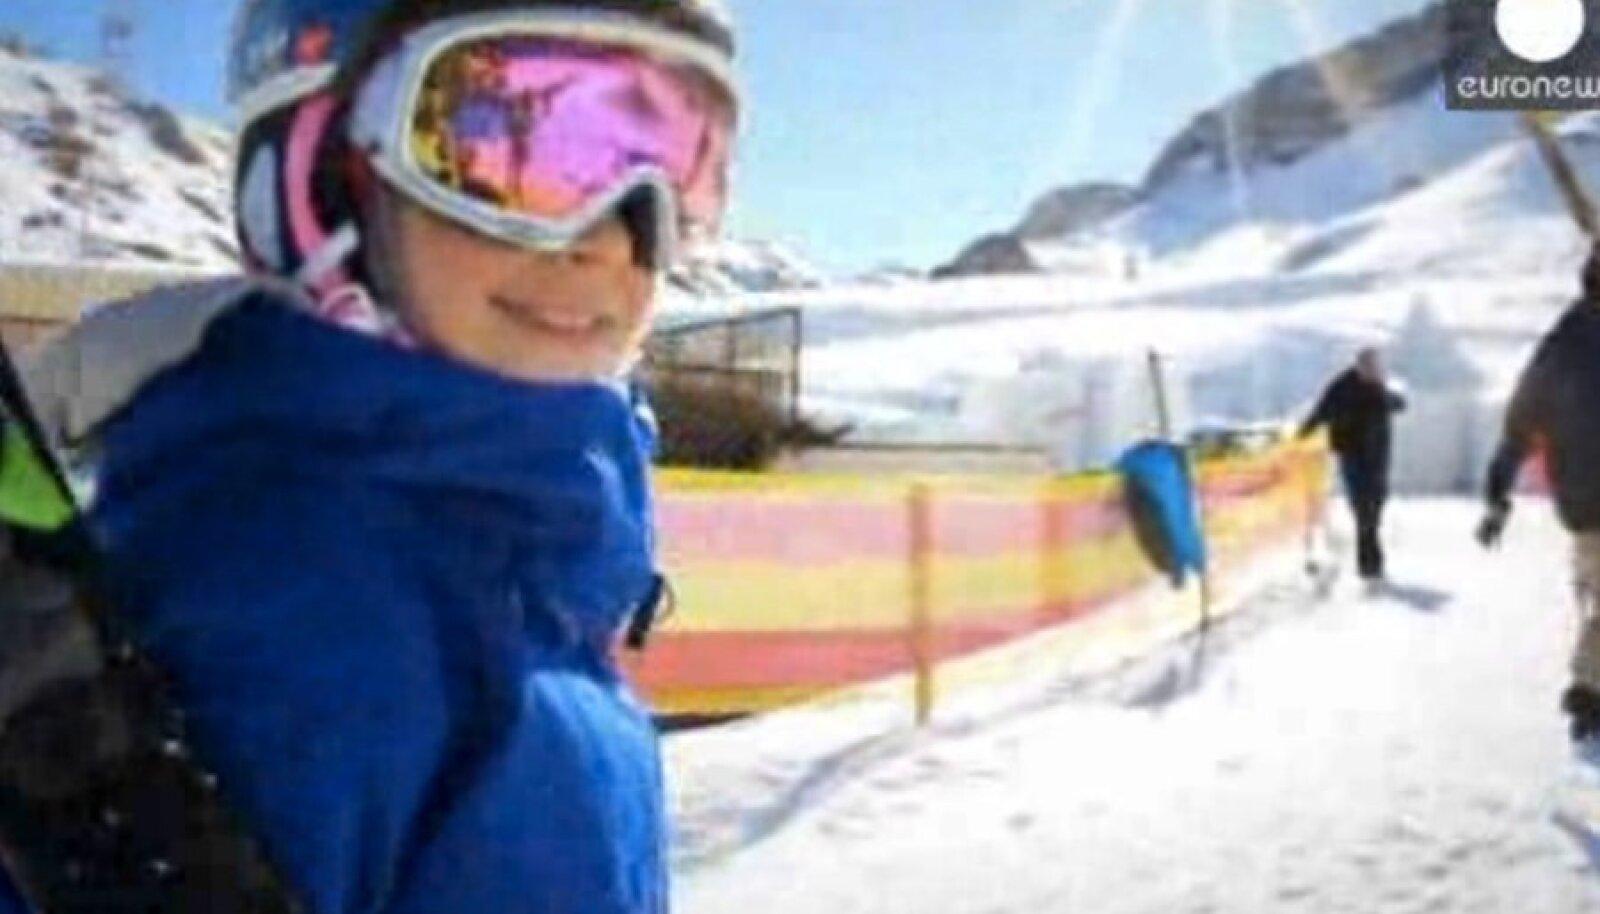 Kelly Sildaru EuroNewsi videos